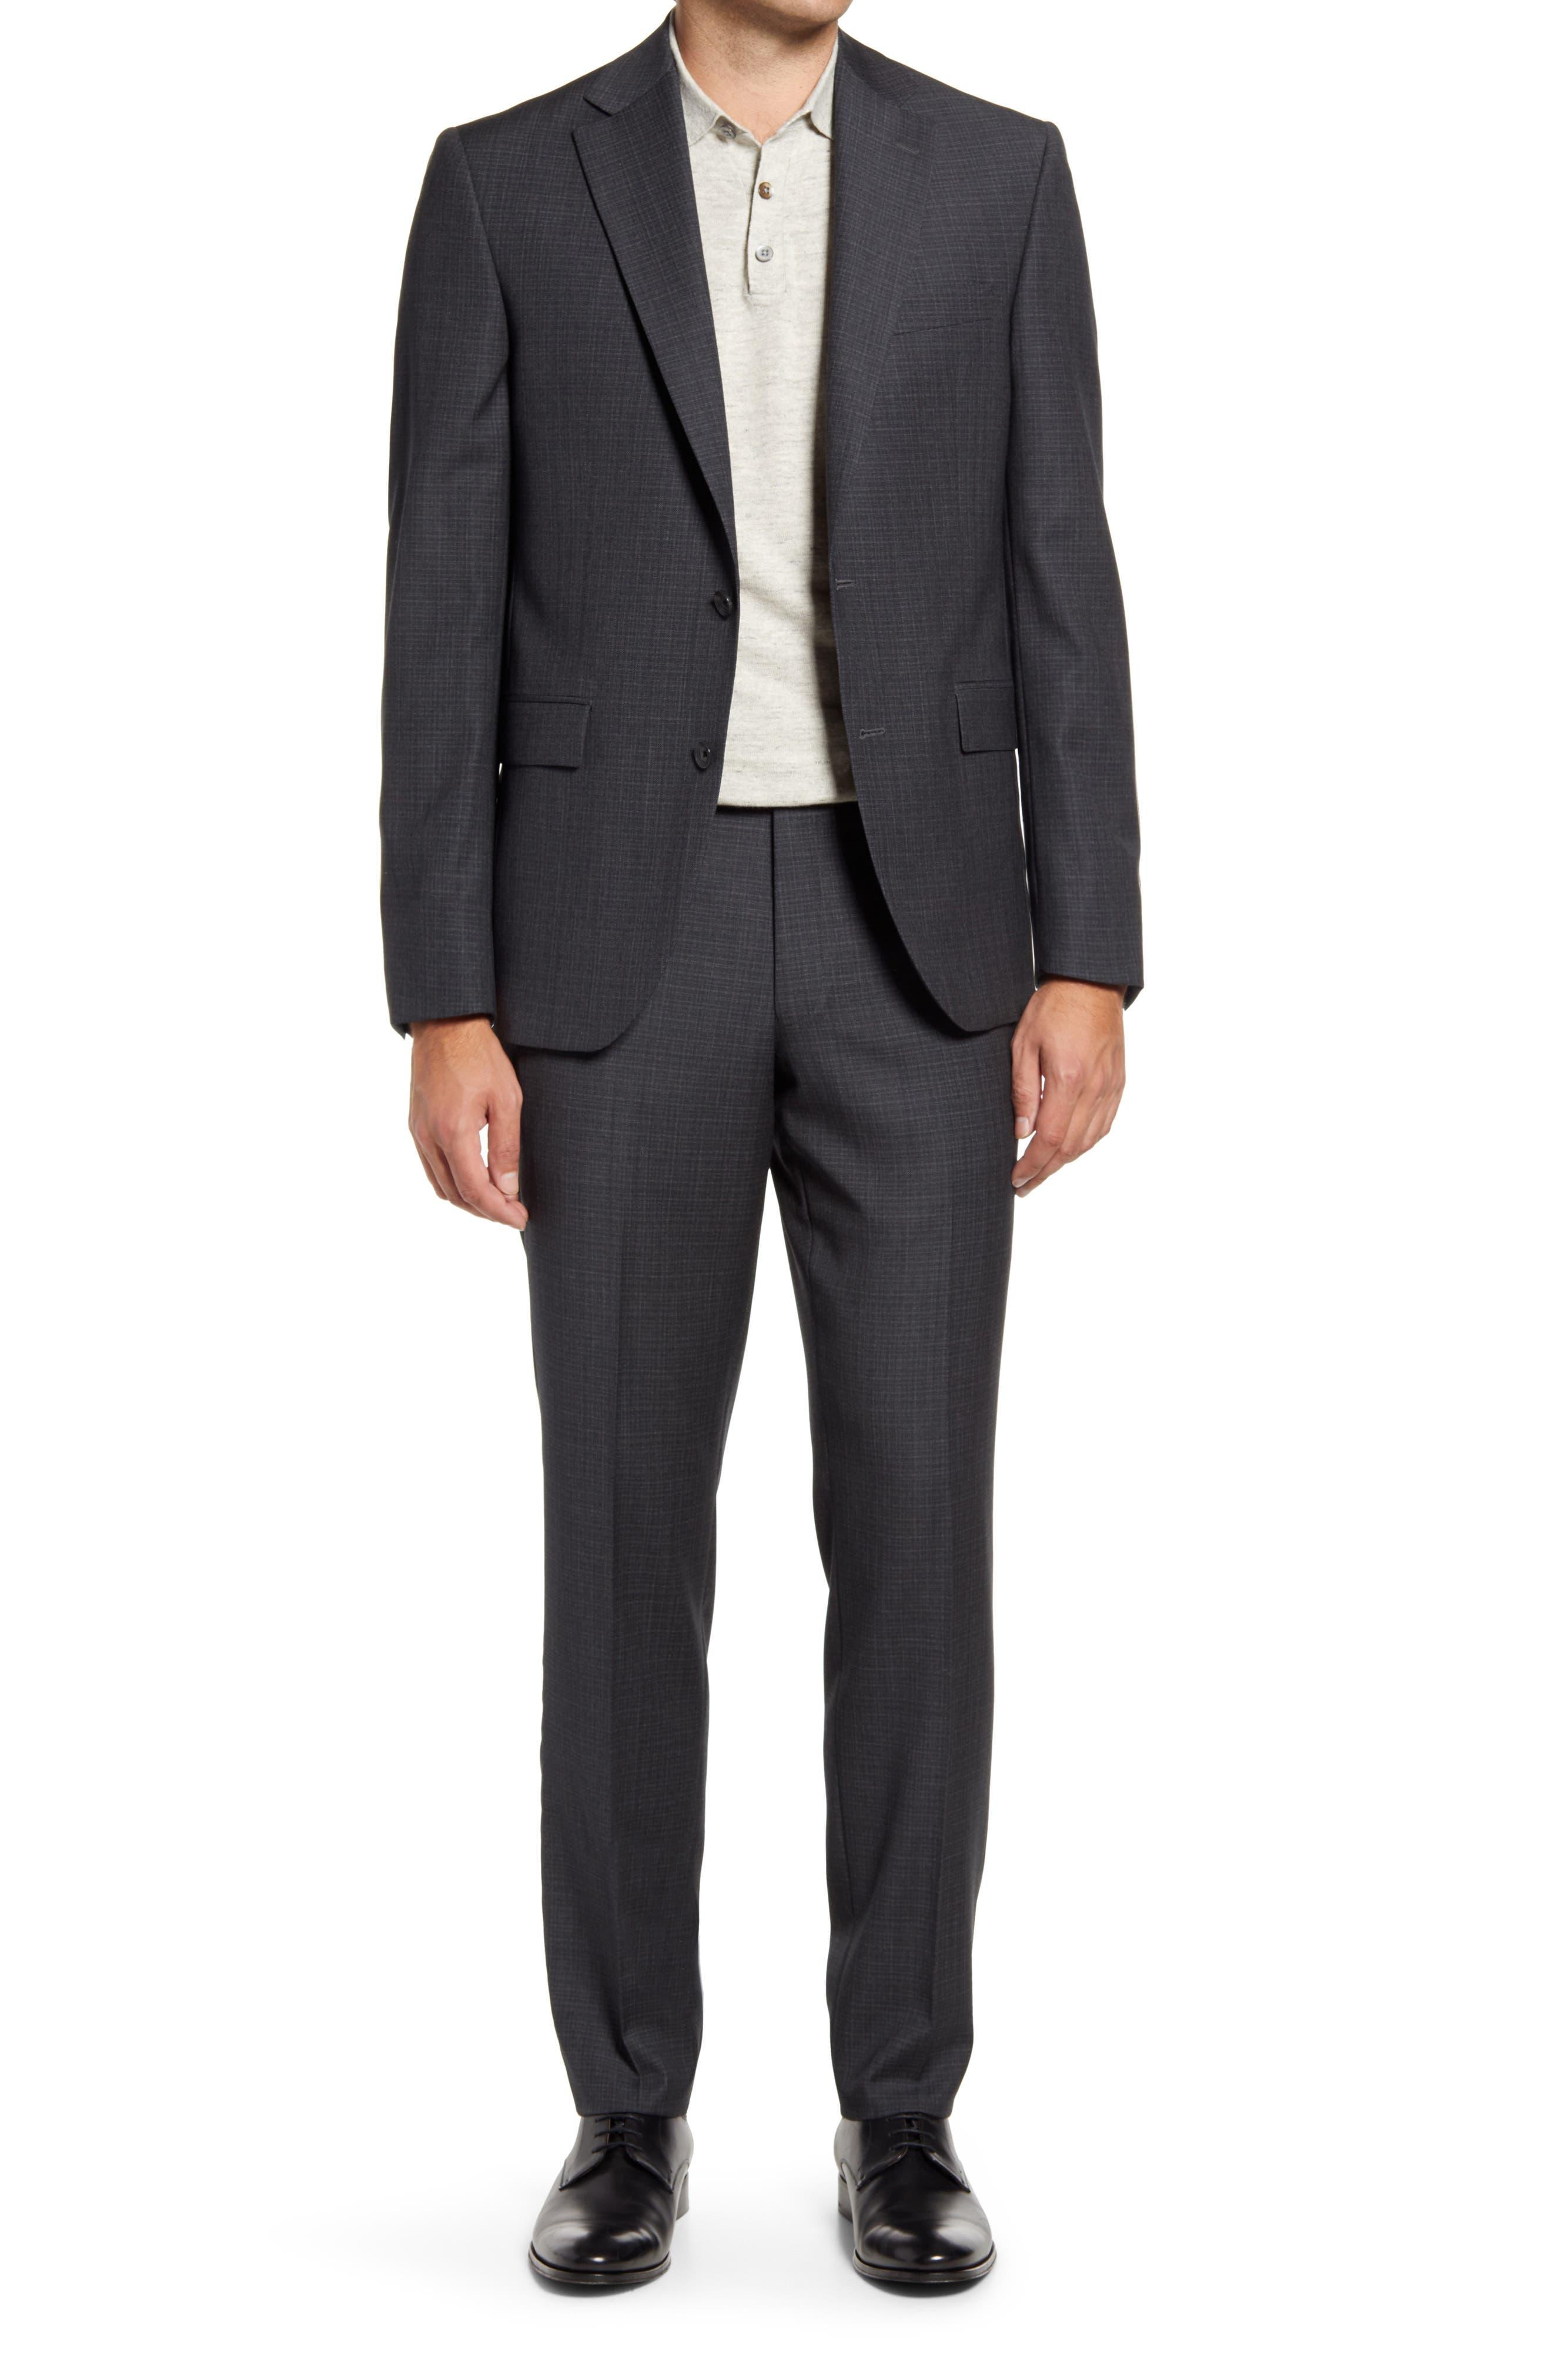 Esprit Charcoal Screen Weave Super 120S Wool Suit